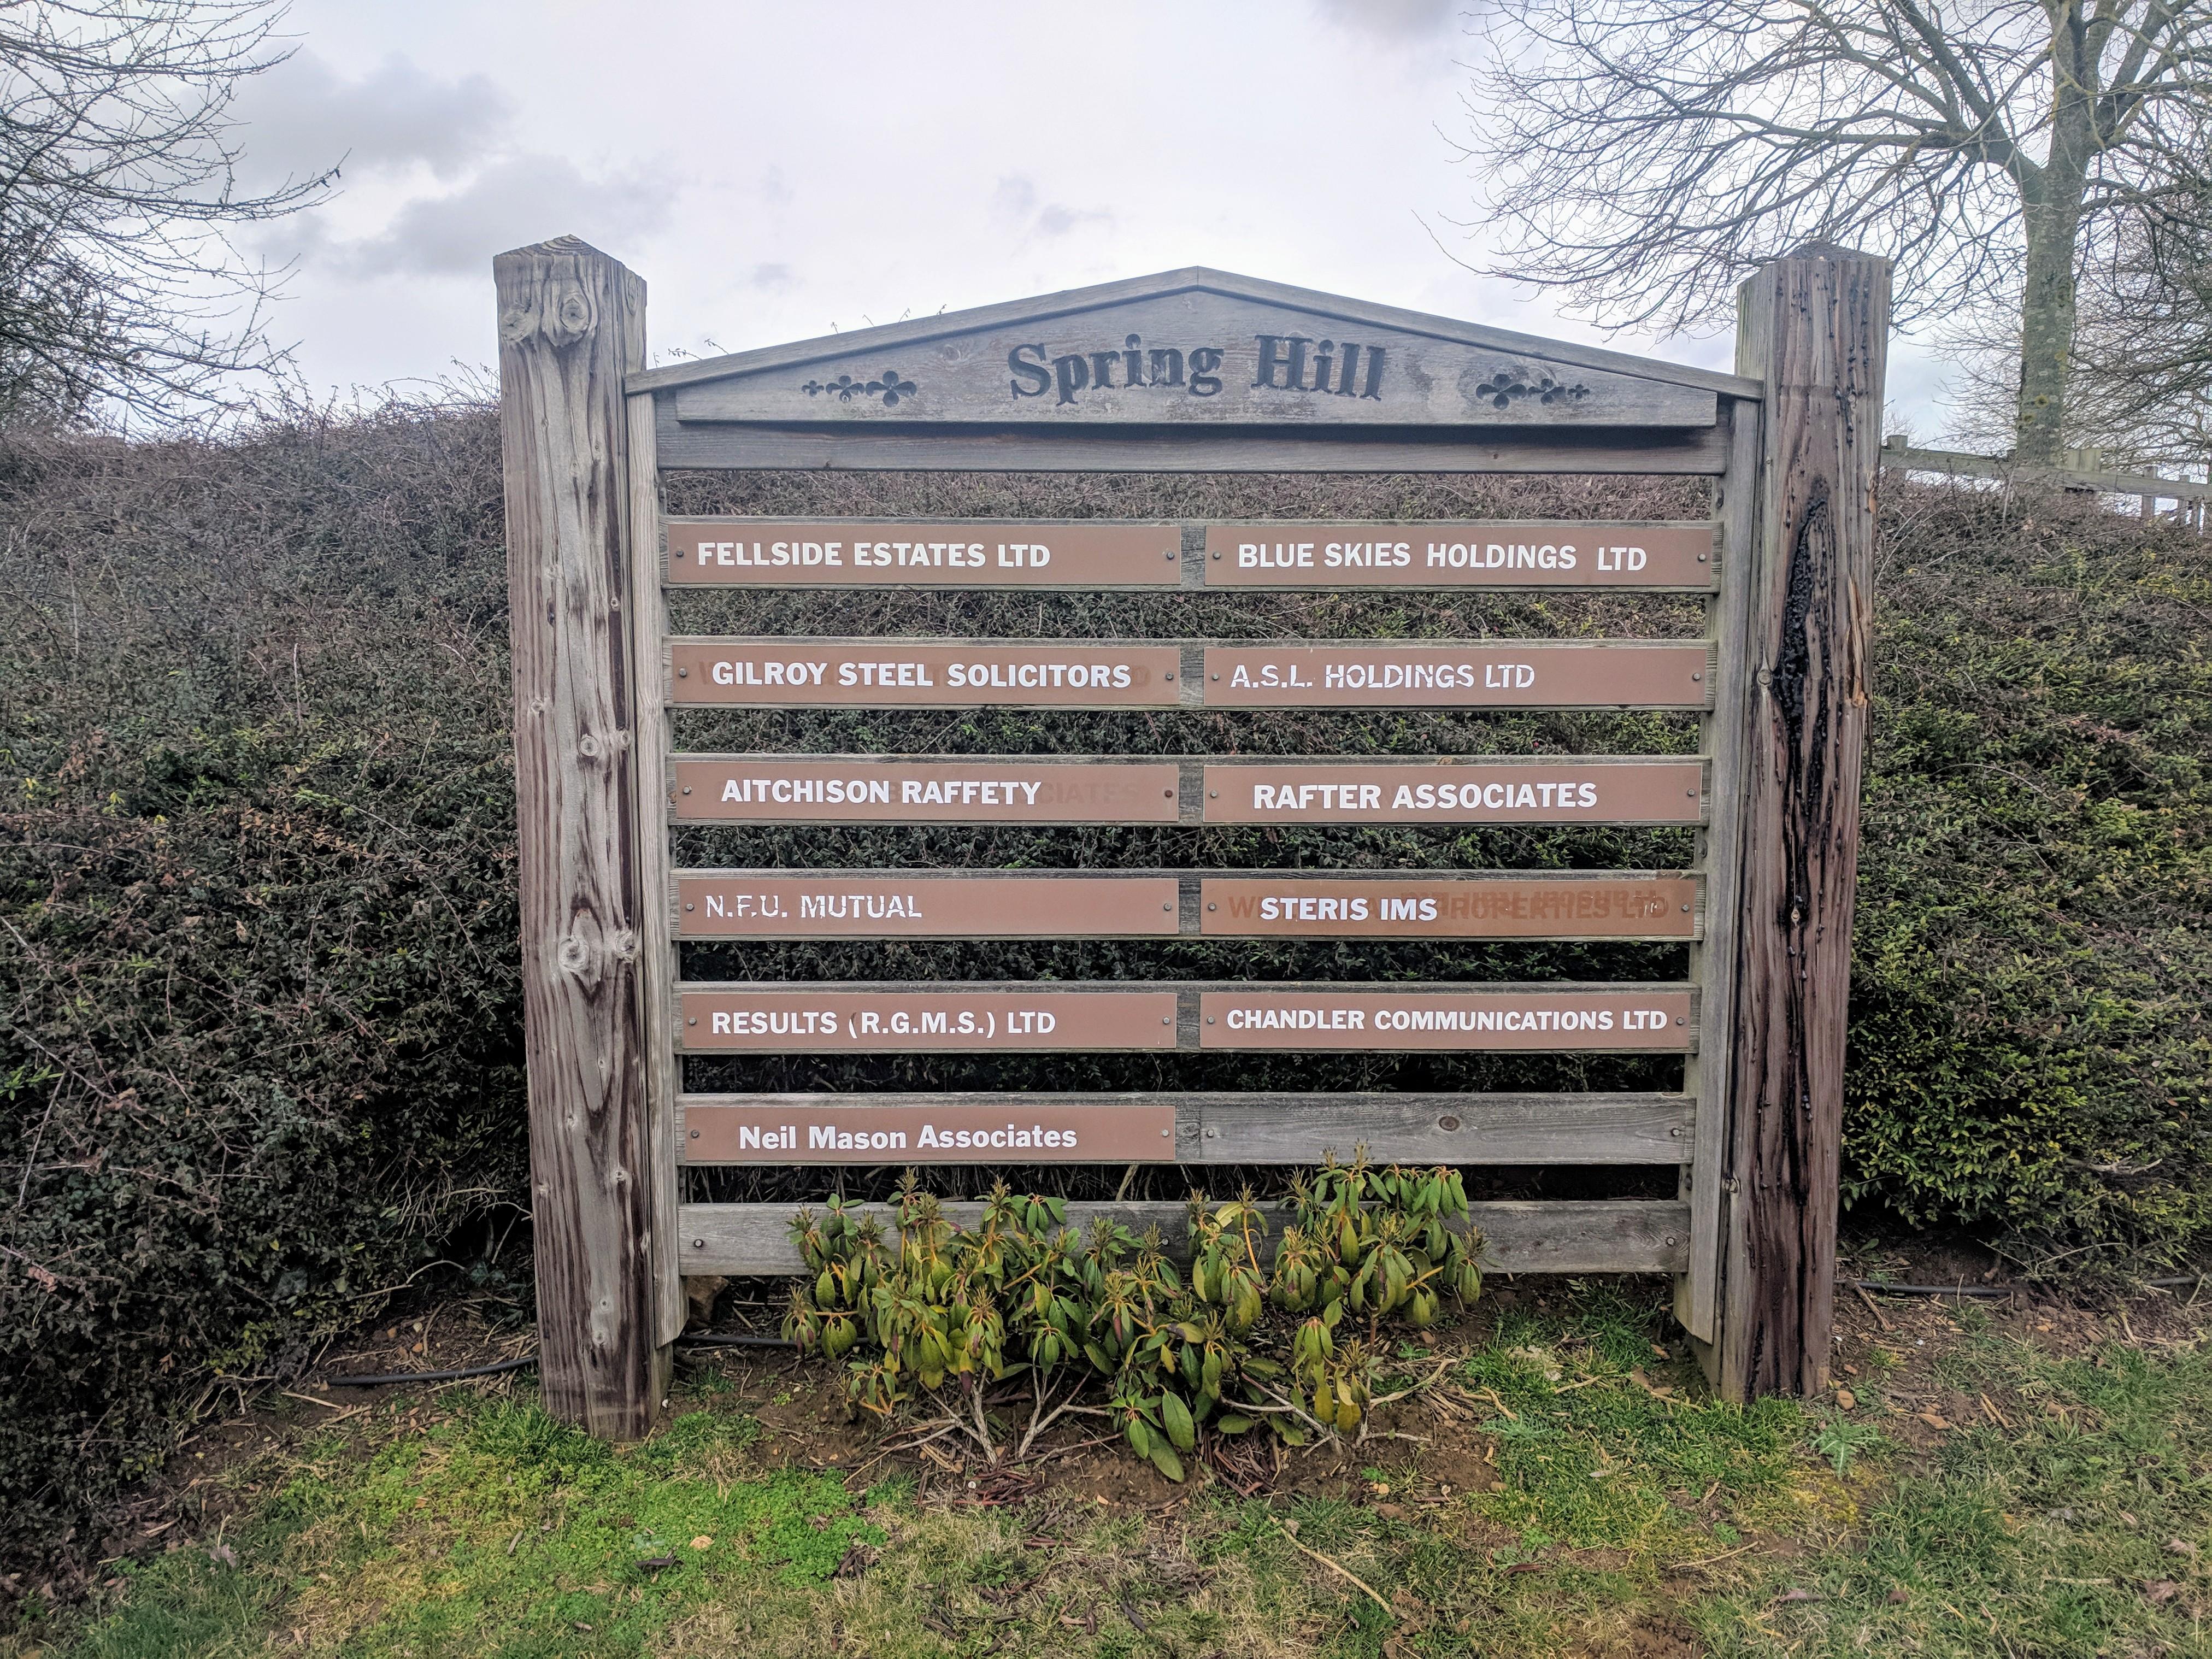 Rafter Wills & Estate Planning Ltd. | 9 Spring Hill Farm, Harborough Road, Pitsford NN6 9AA | +44 1604 889073